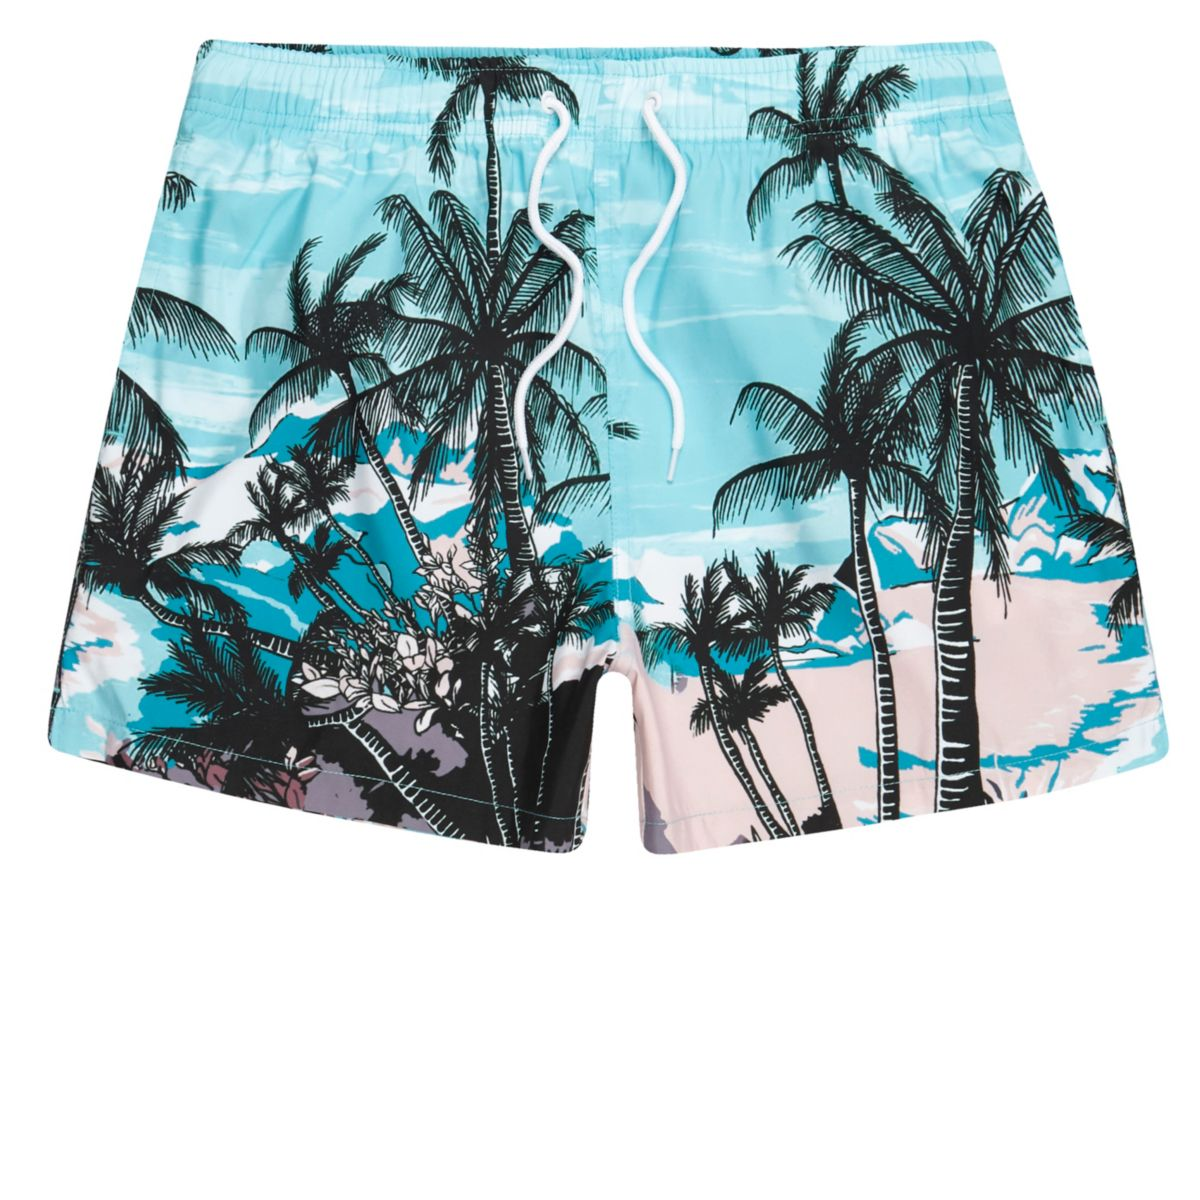 Blauwe zwemshort met palmboom- en strandscèneprint